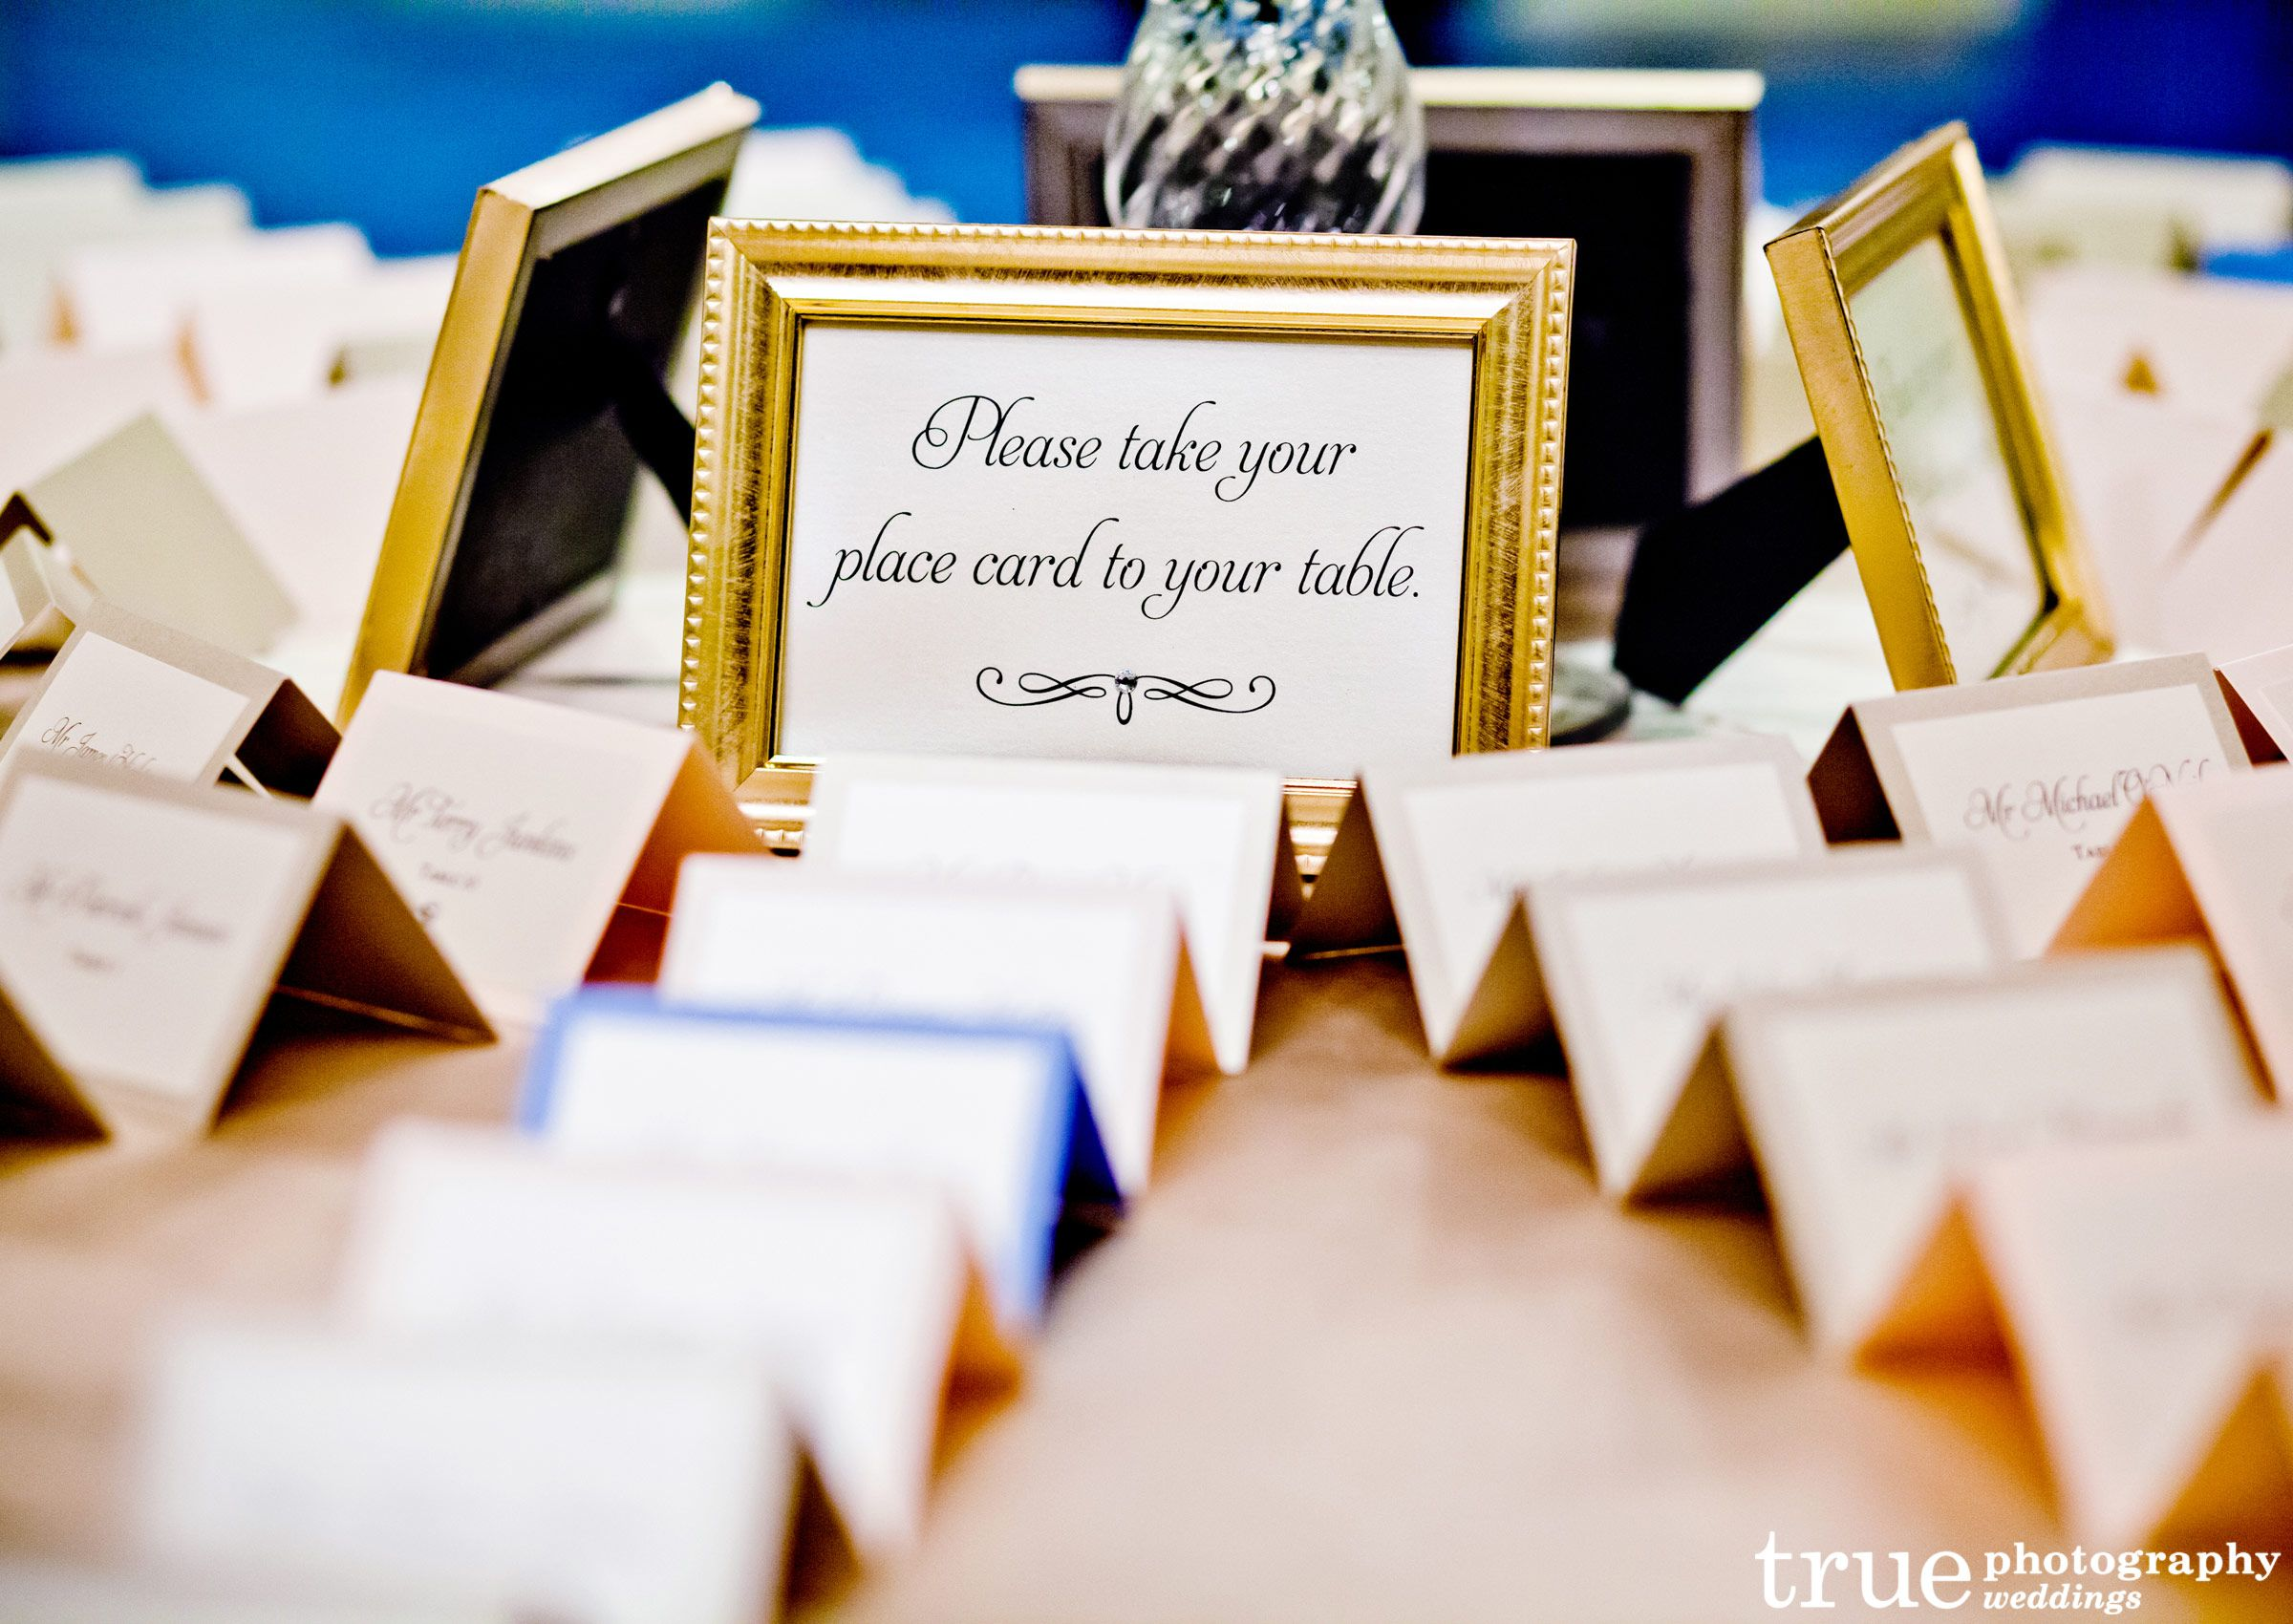 T Creative Wedding Reception Place Card Display Ideas